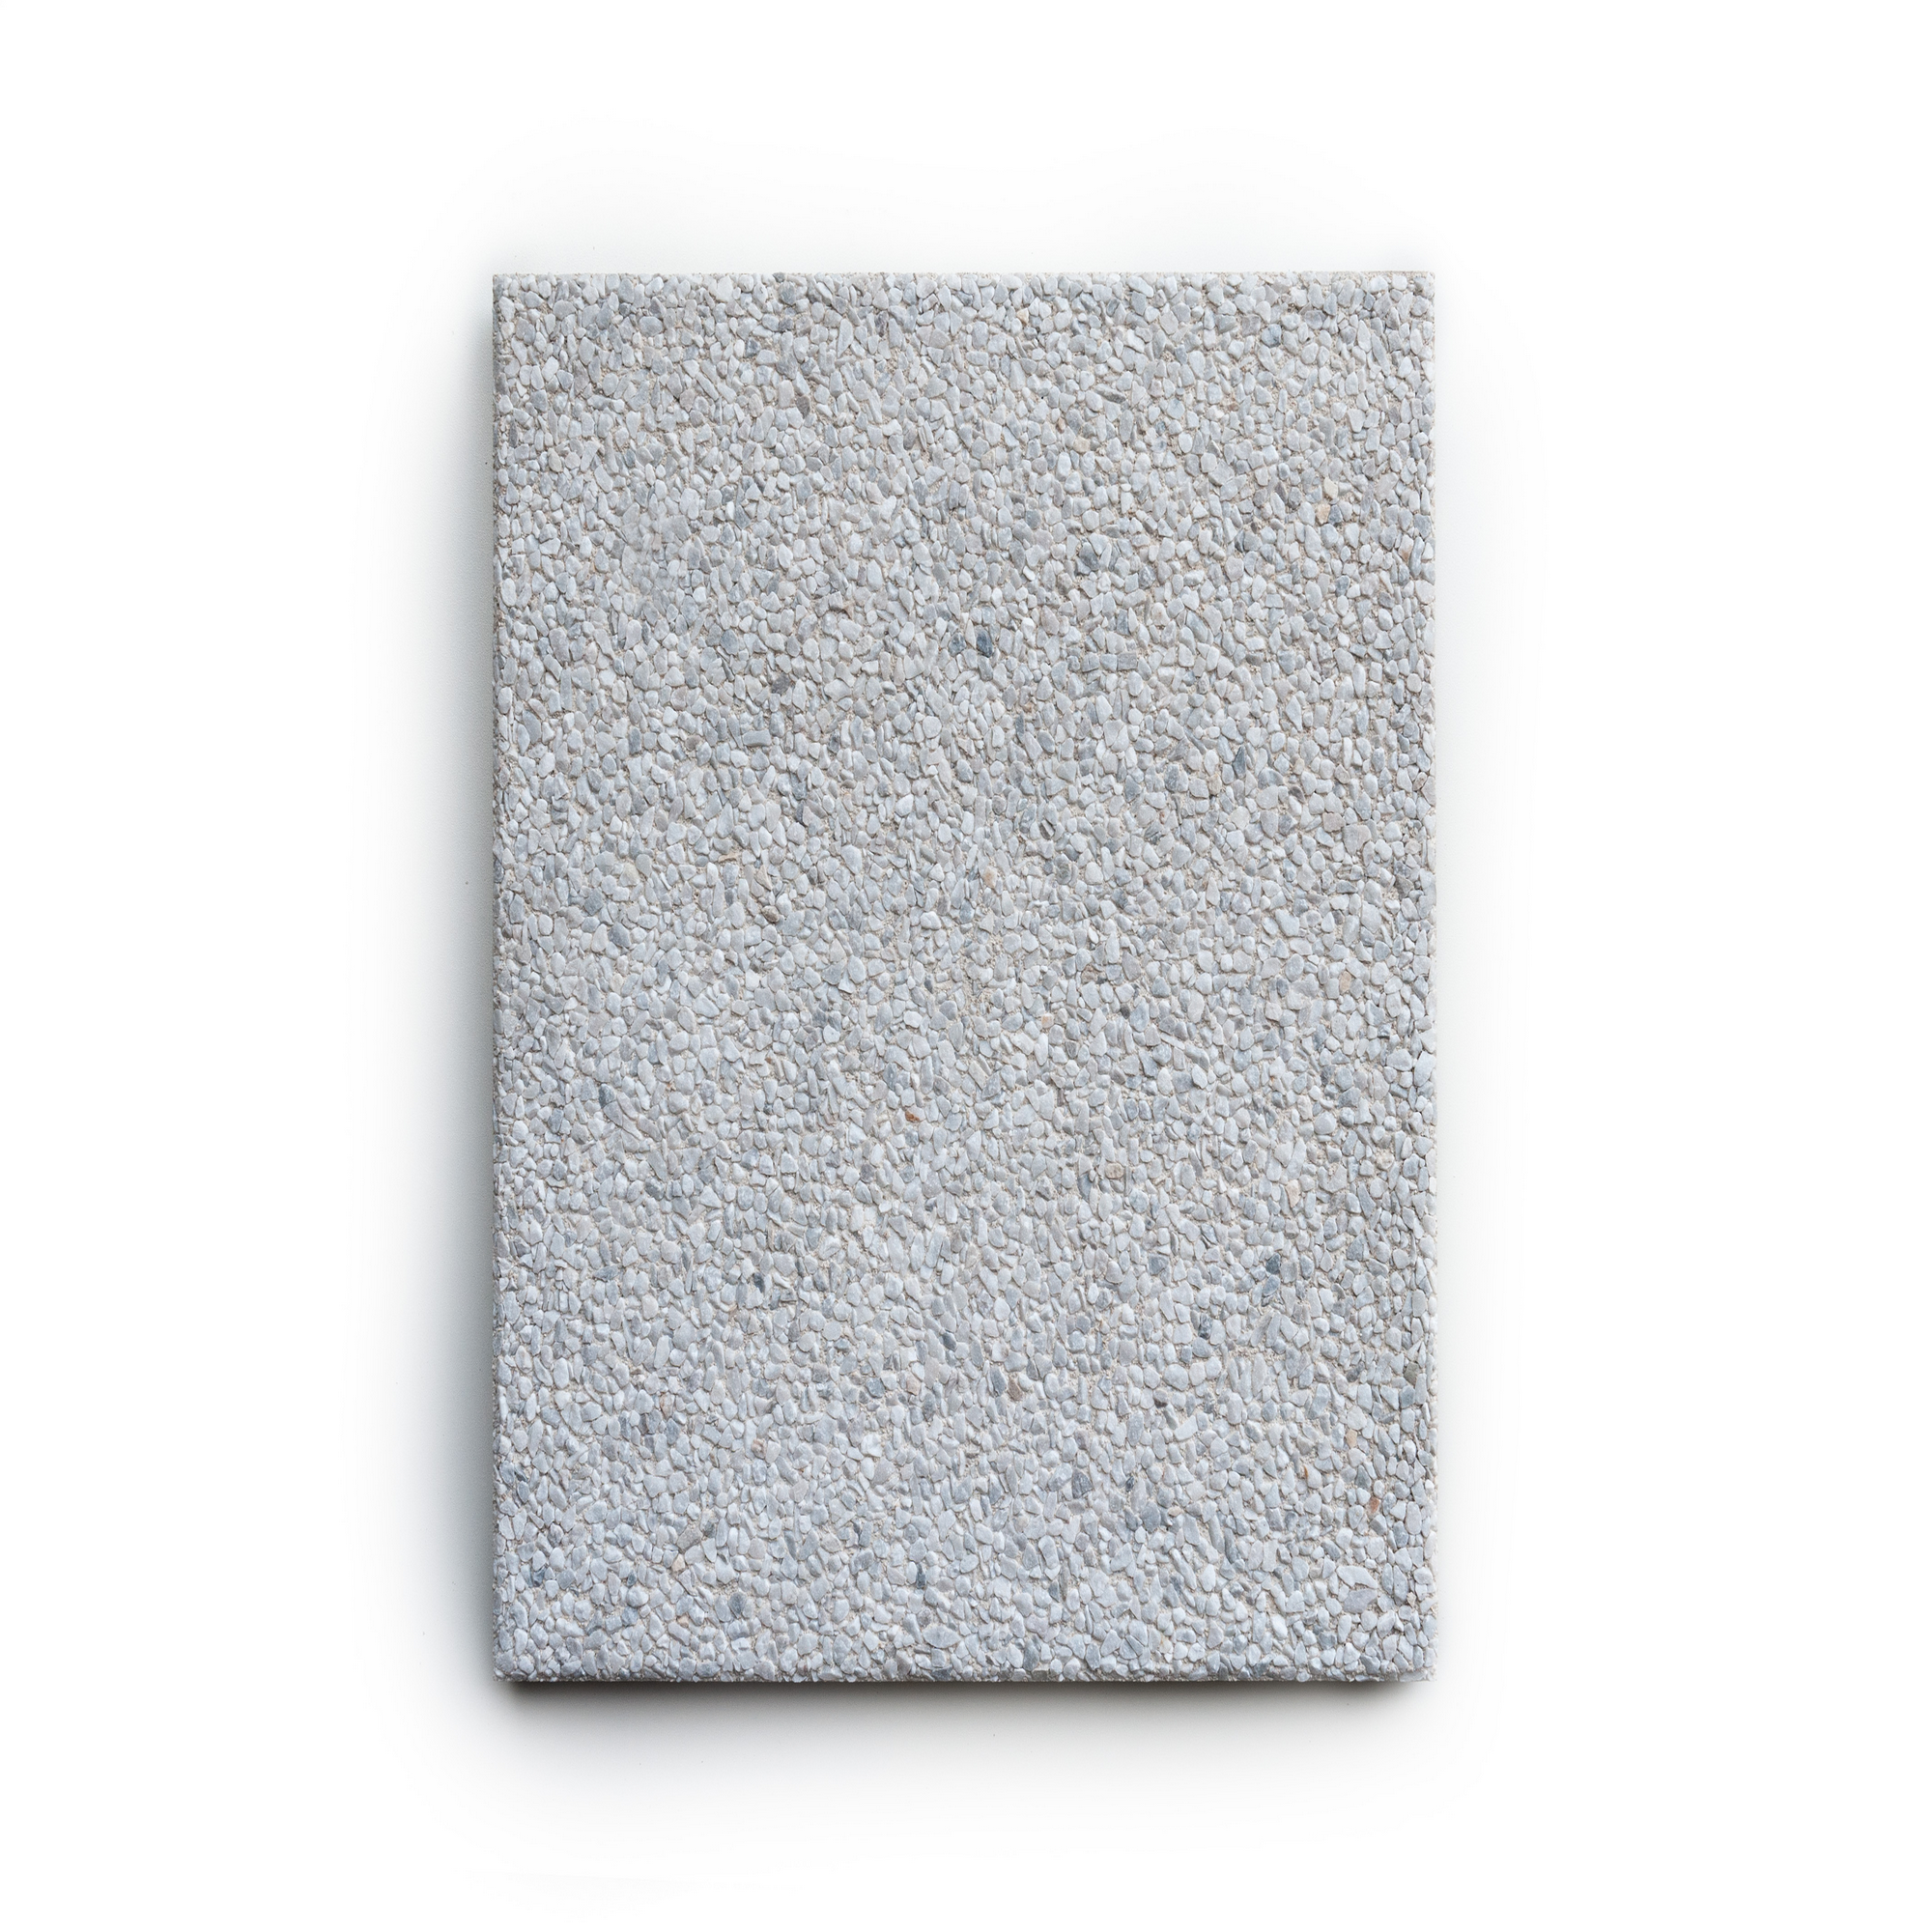 Platte BiancoCarrara 20 x 20 x 20,20 cm